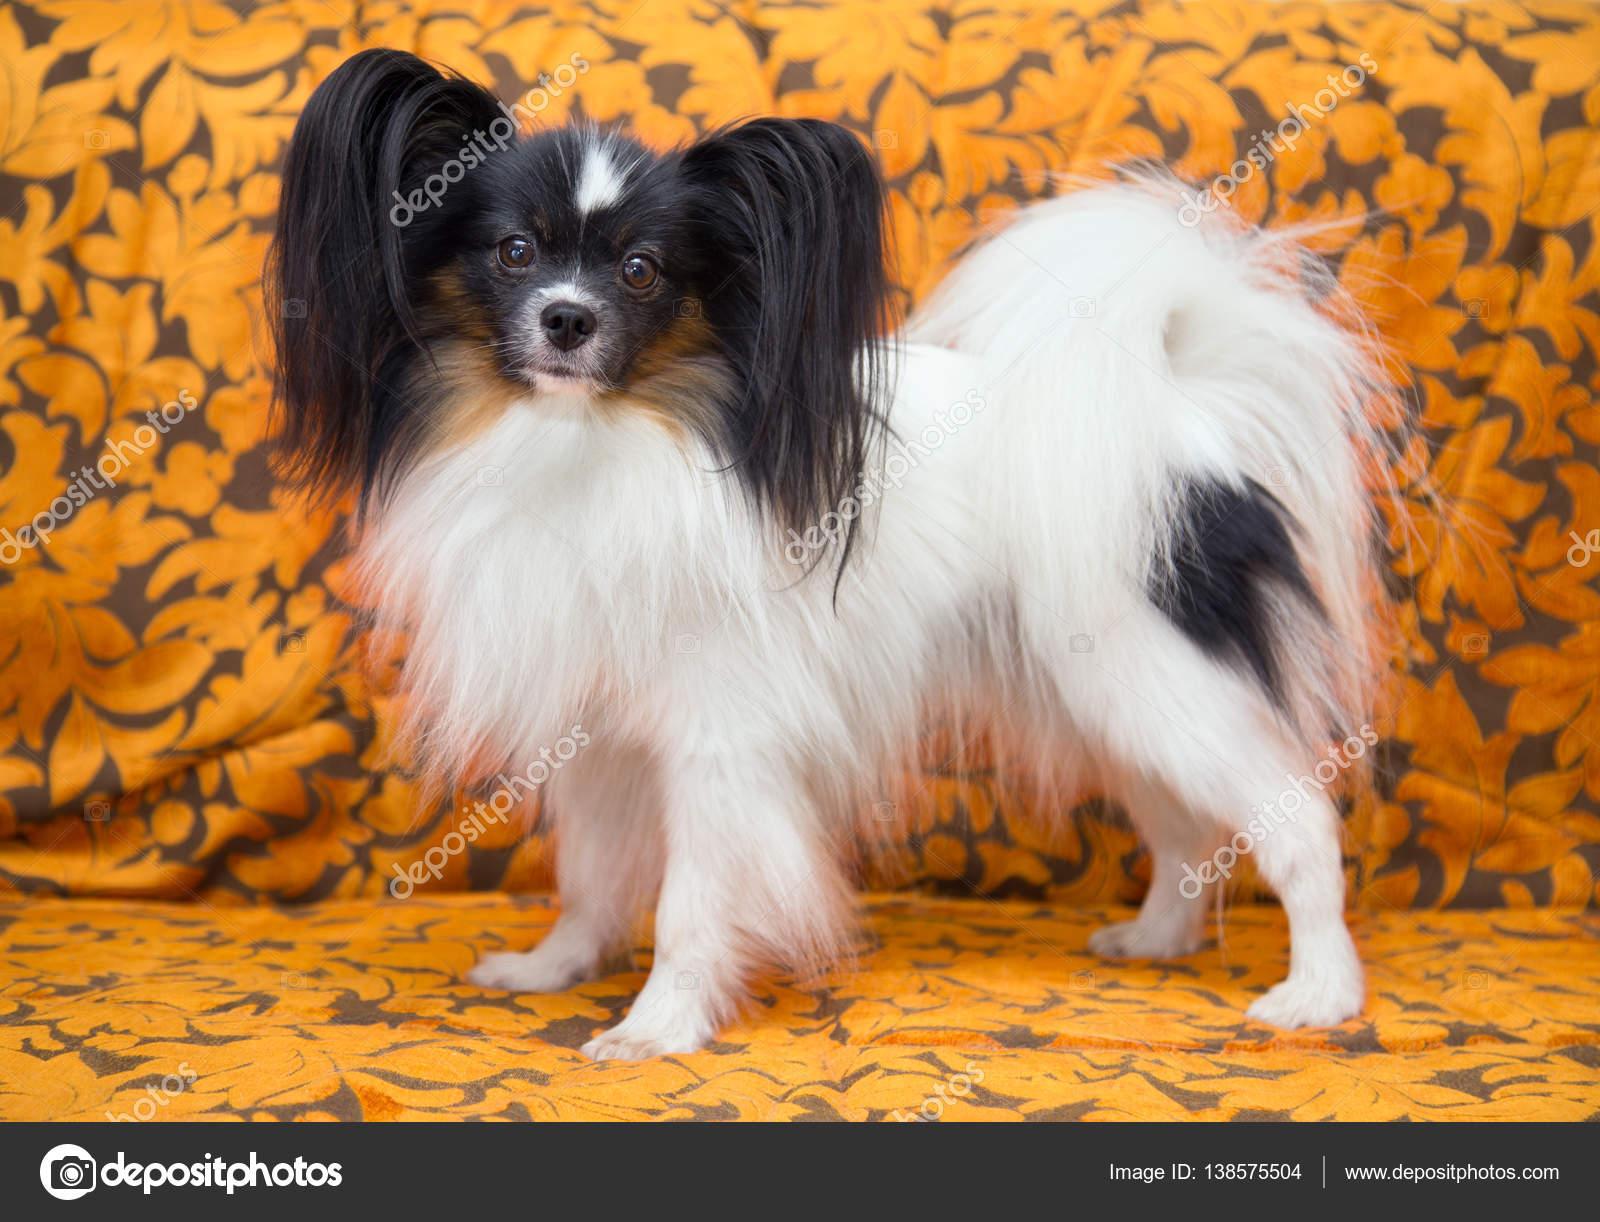 Fantastic Papillon Canine Adorable Dog - depositphotos_138575504-stock-photo-portrait-of-a-dog-breed  HD_32562  .jpg